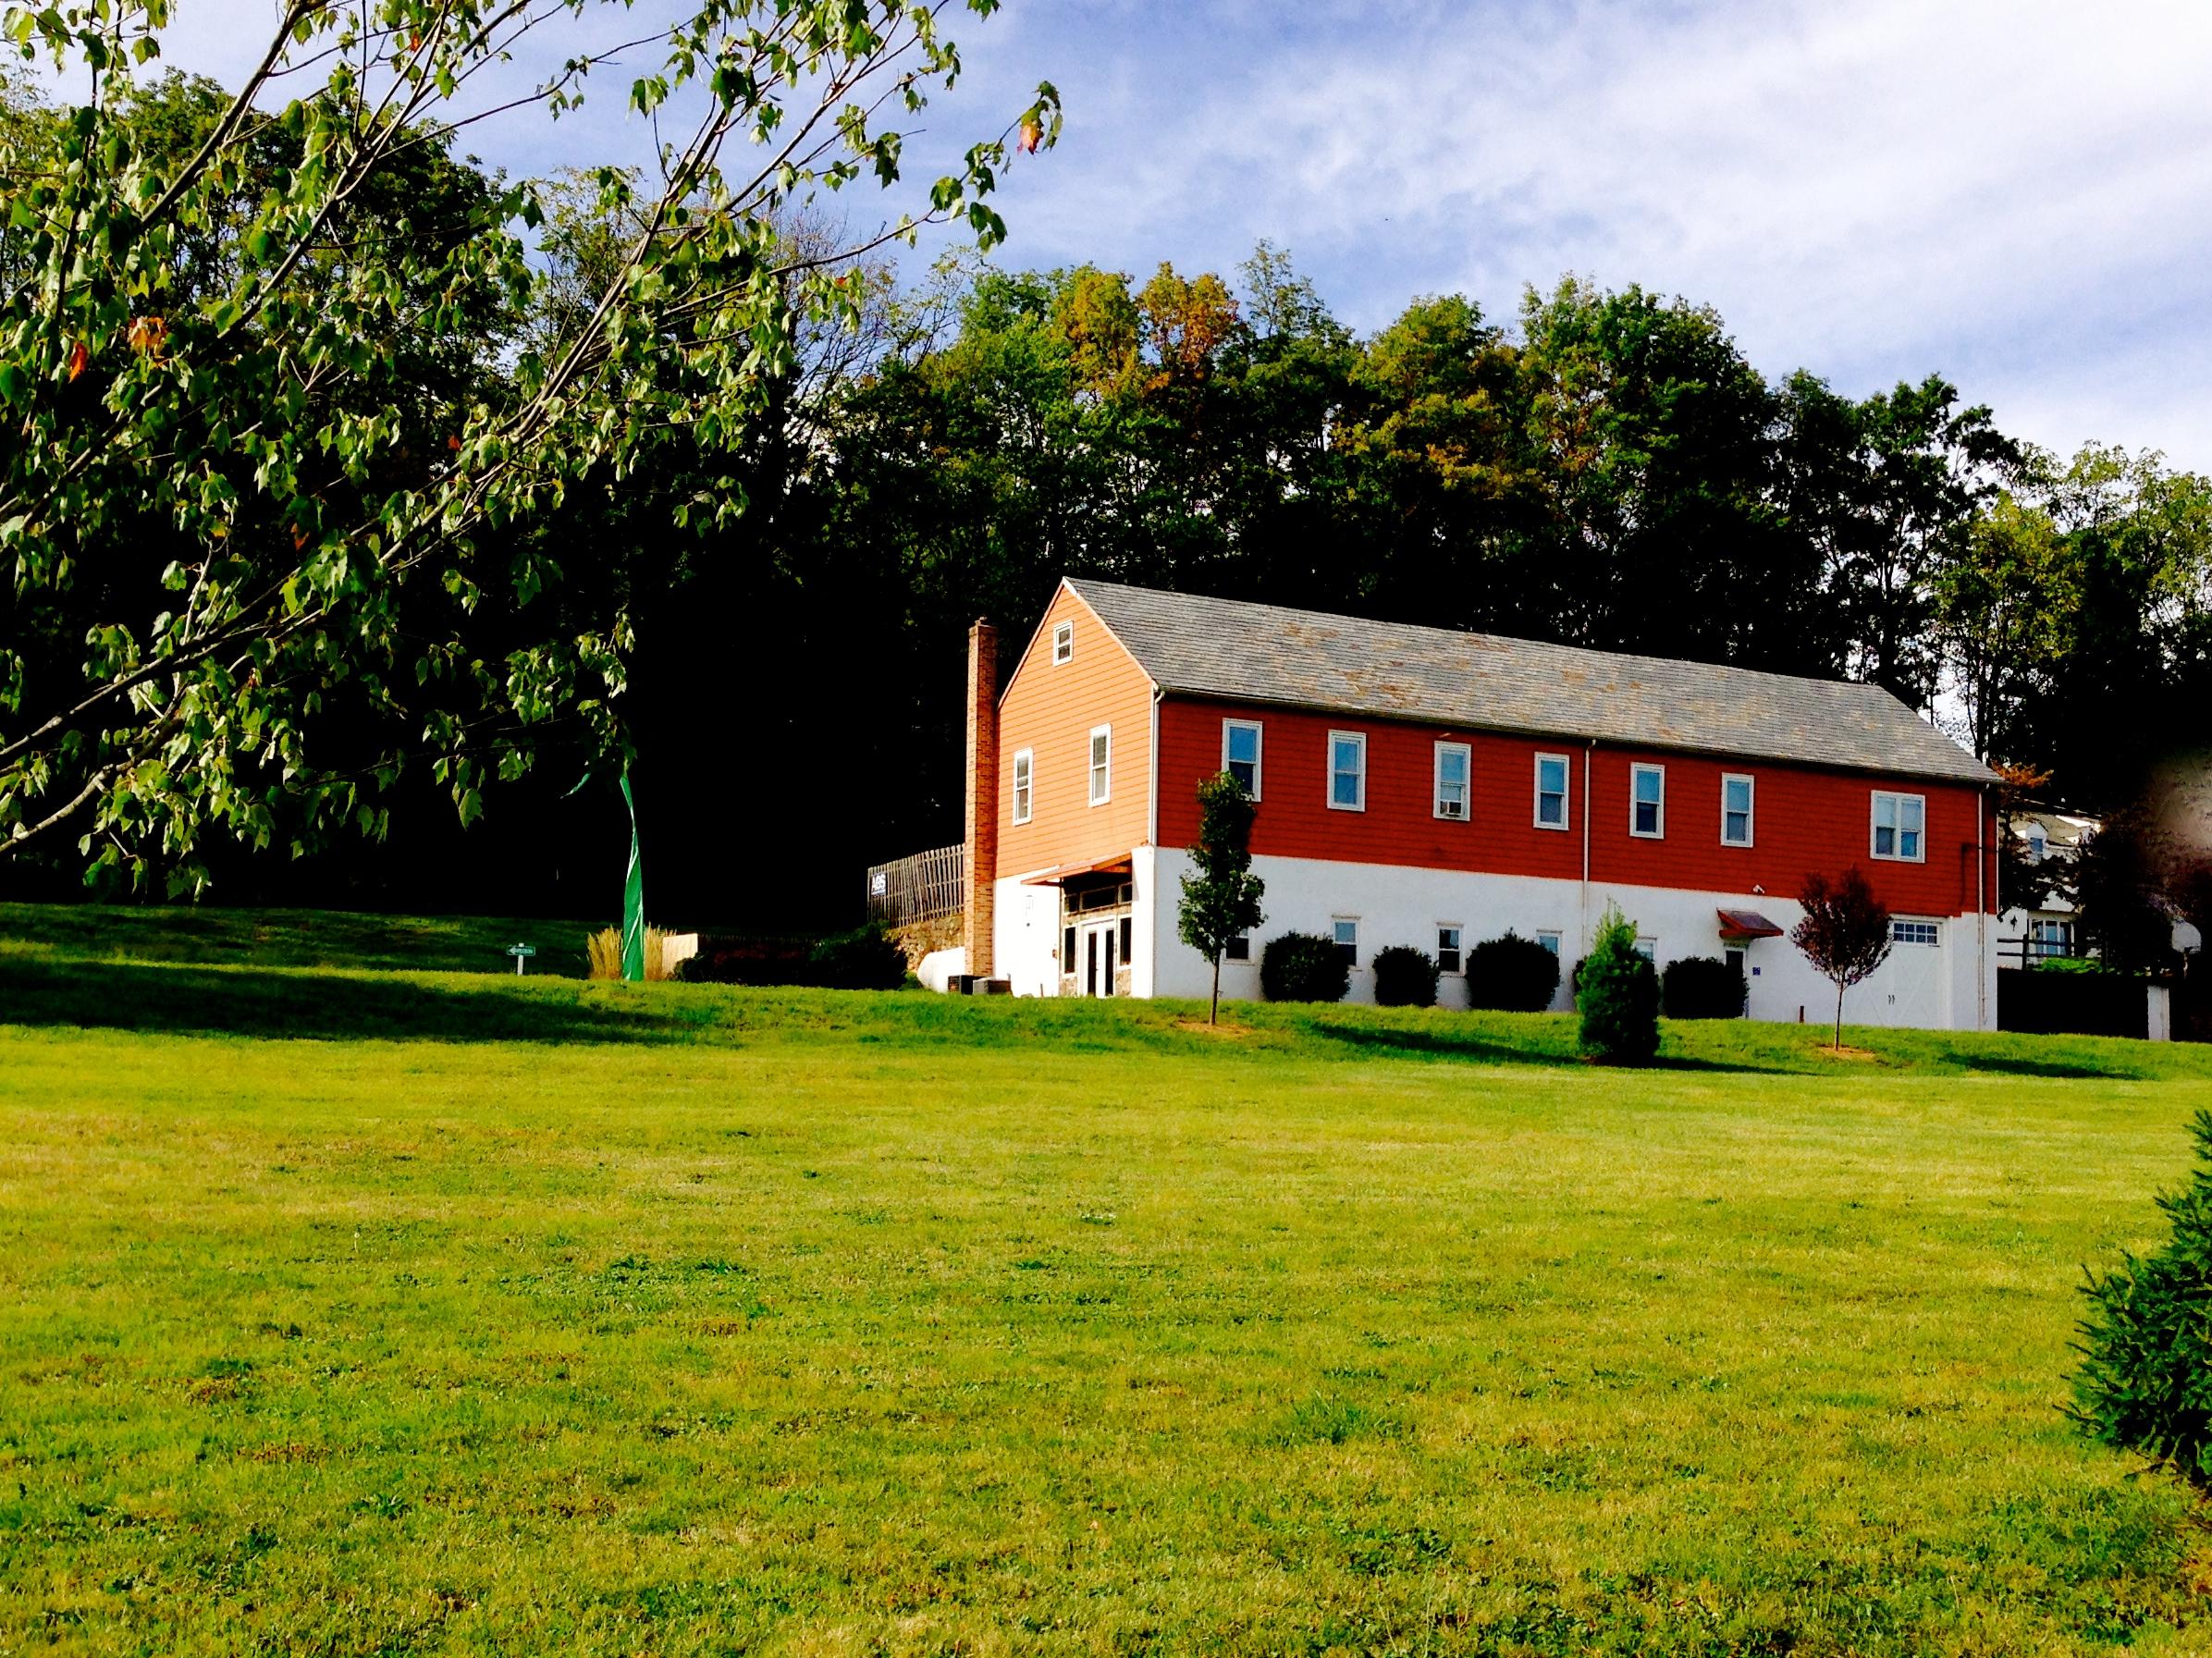 Unity Barn, Doylestown, PA